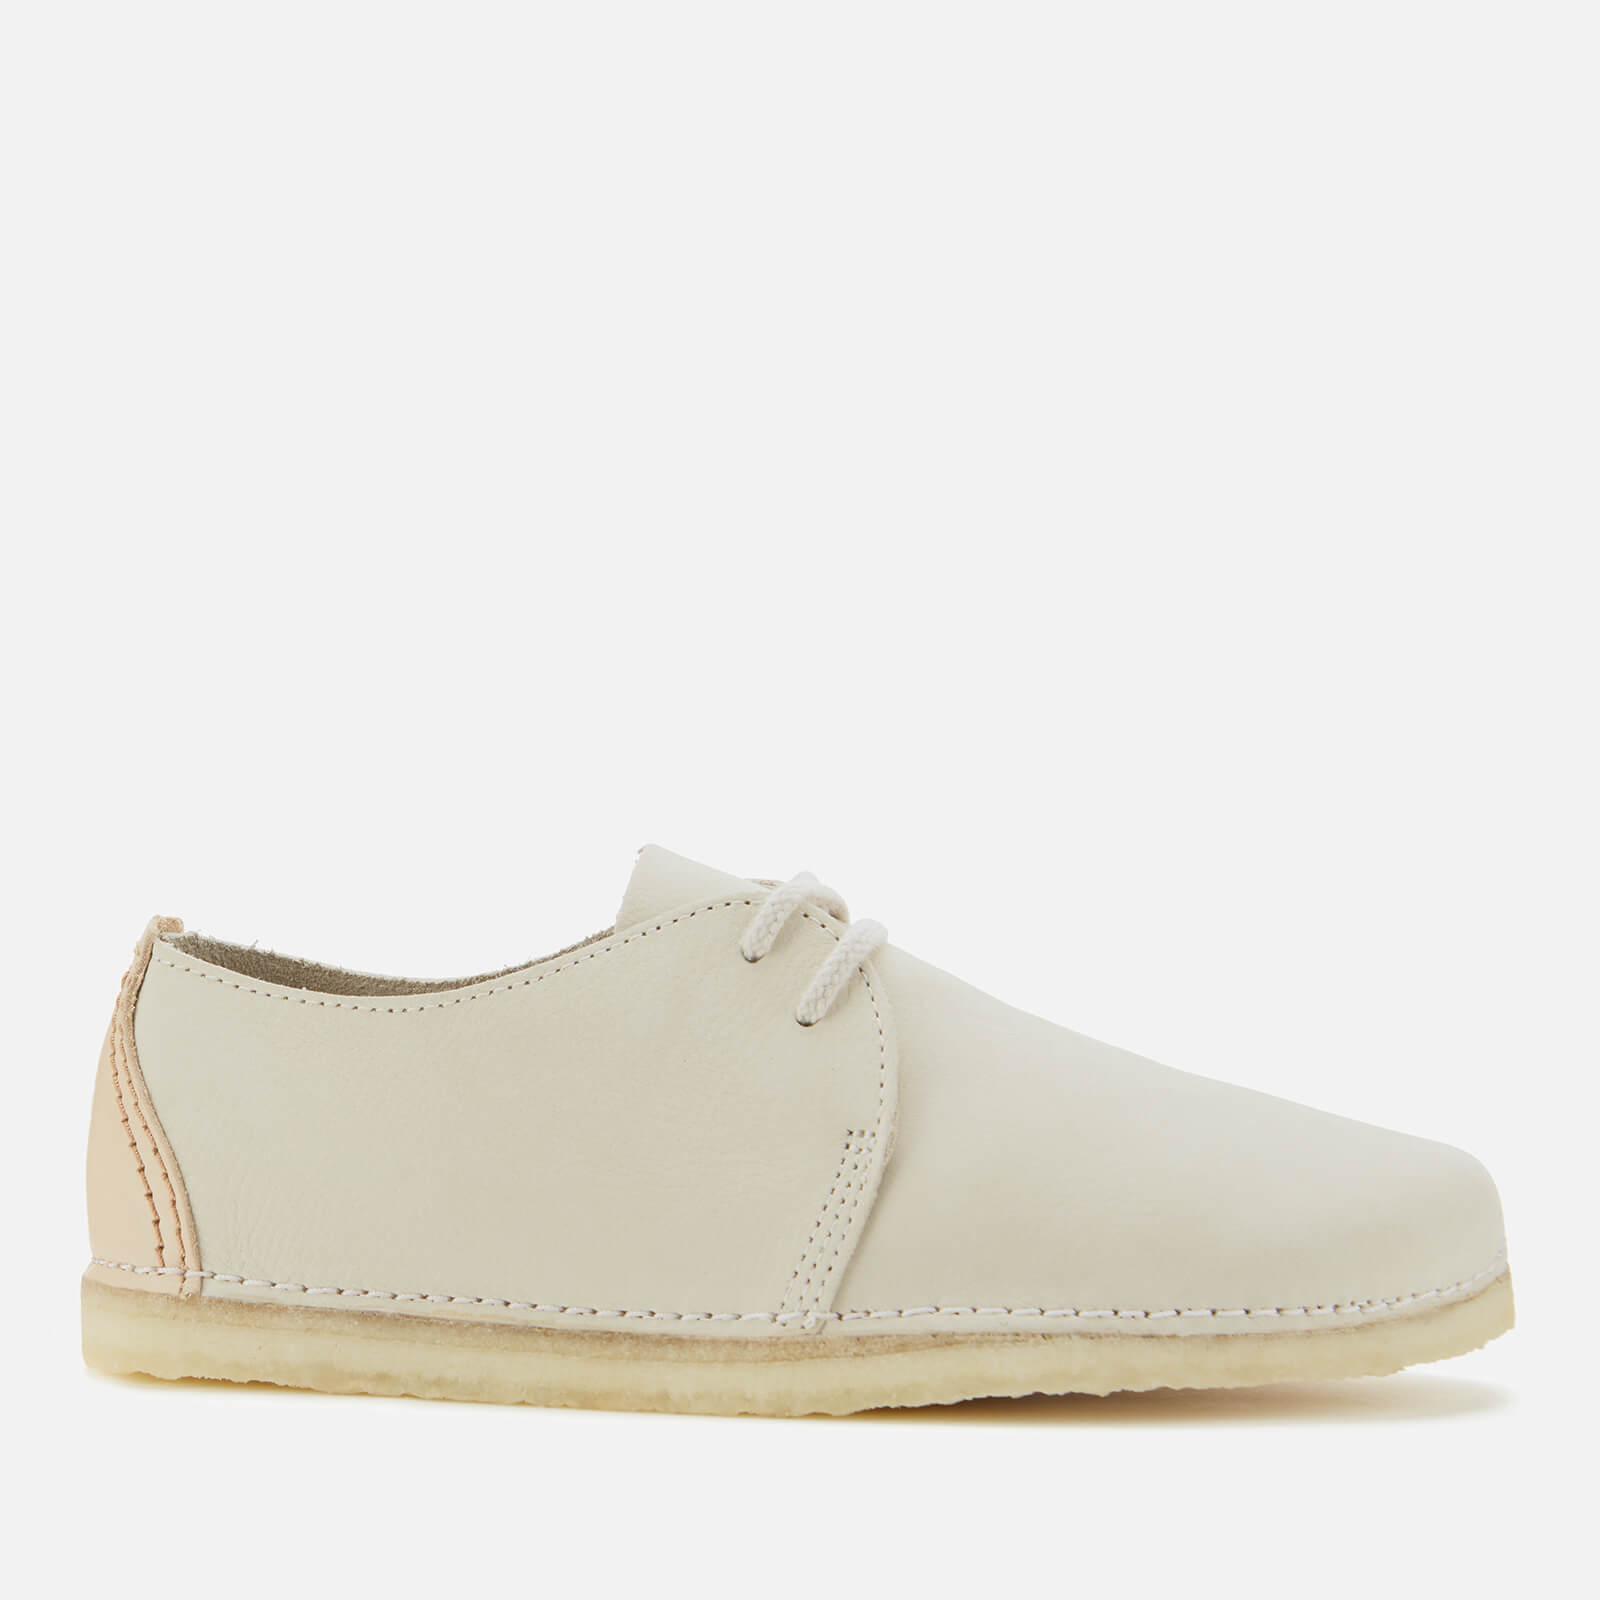 Clarks Originals Women's Ashton Nubuck Flat Shoes - Off White - UK 6